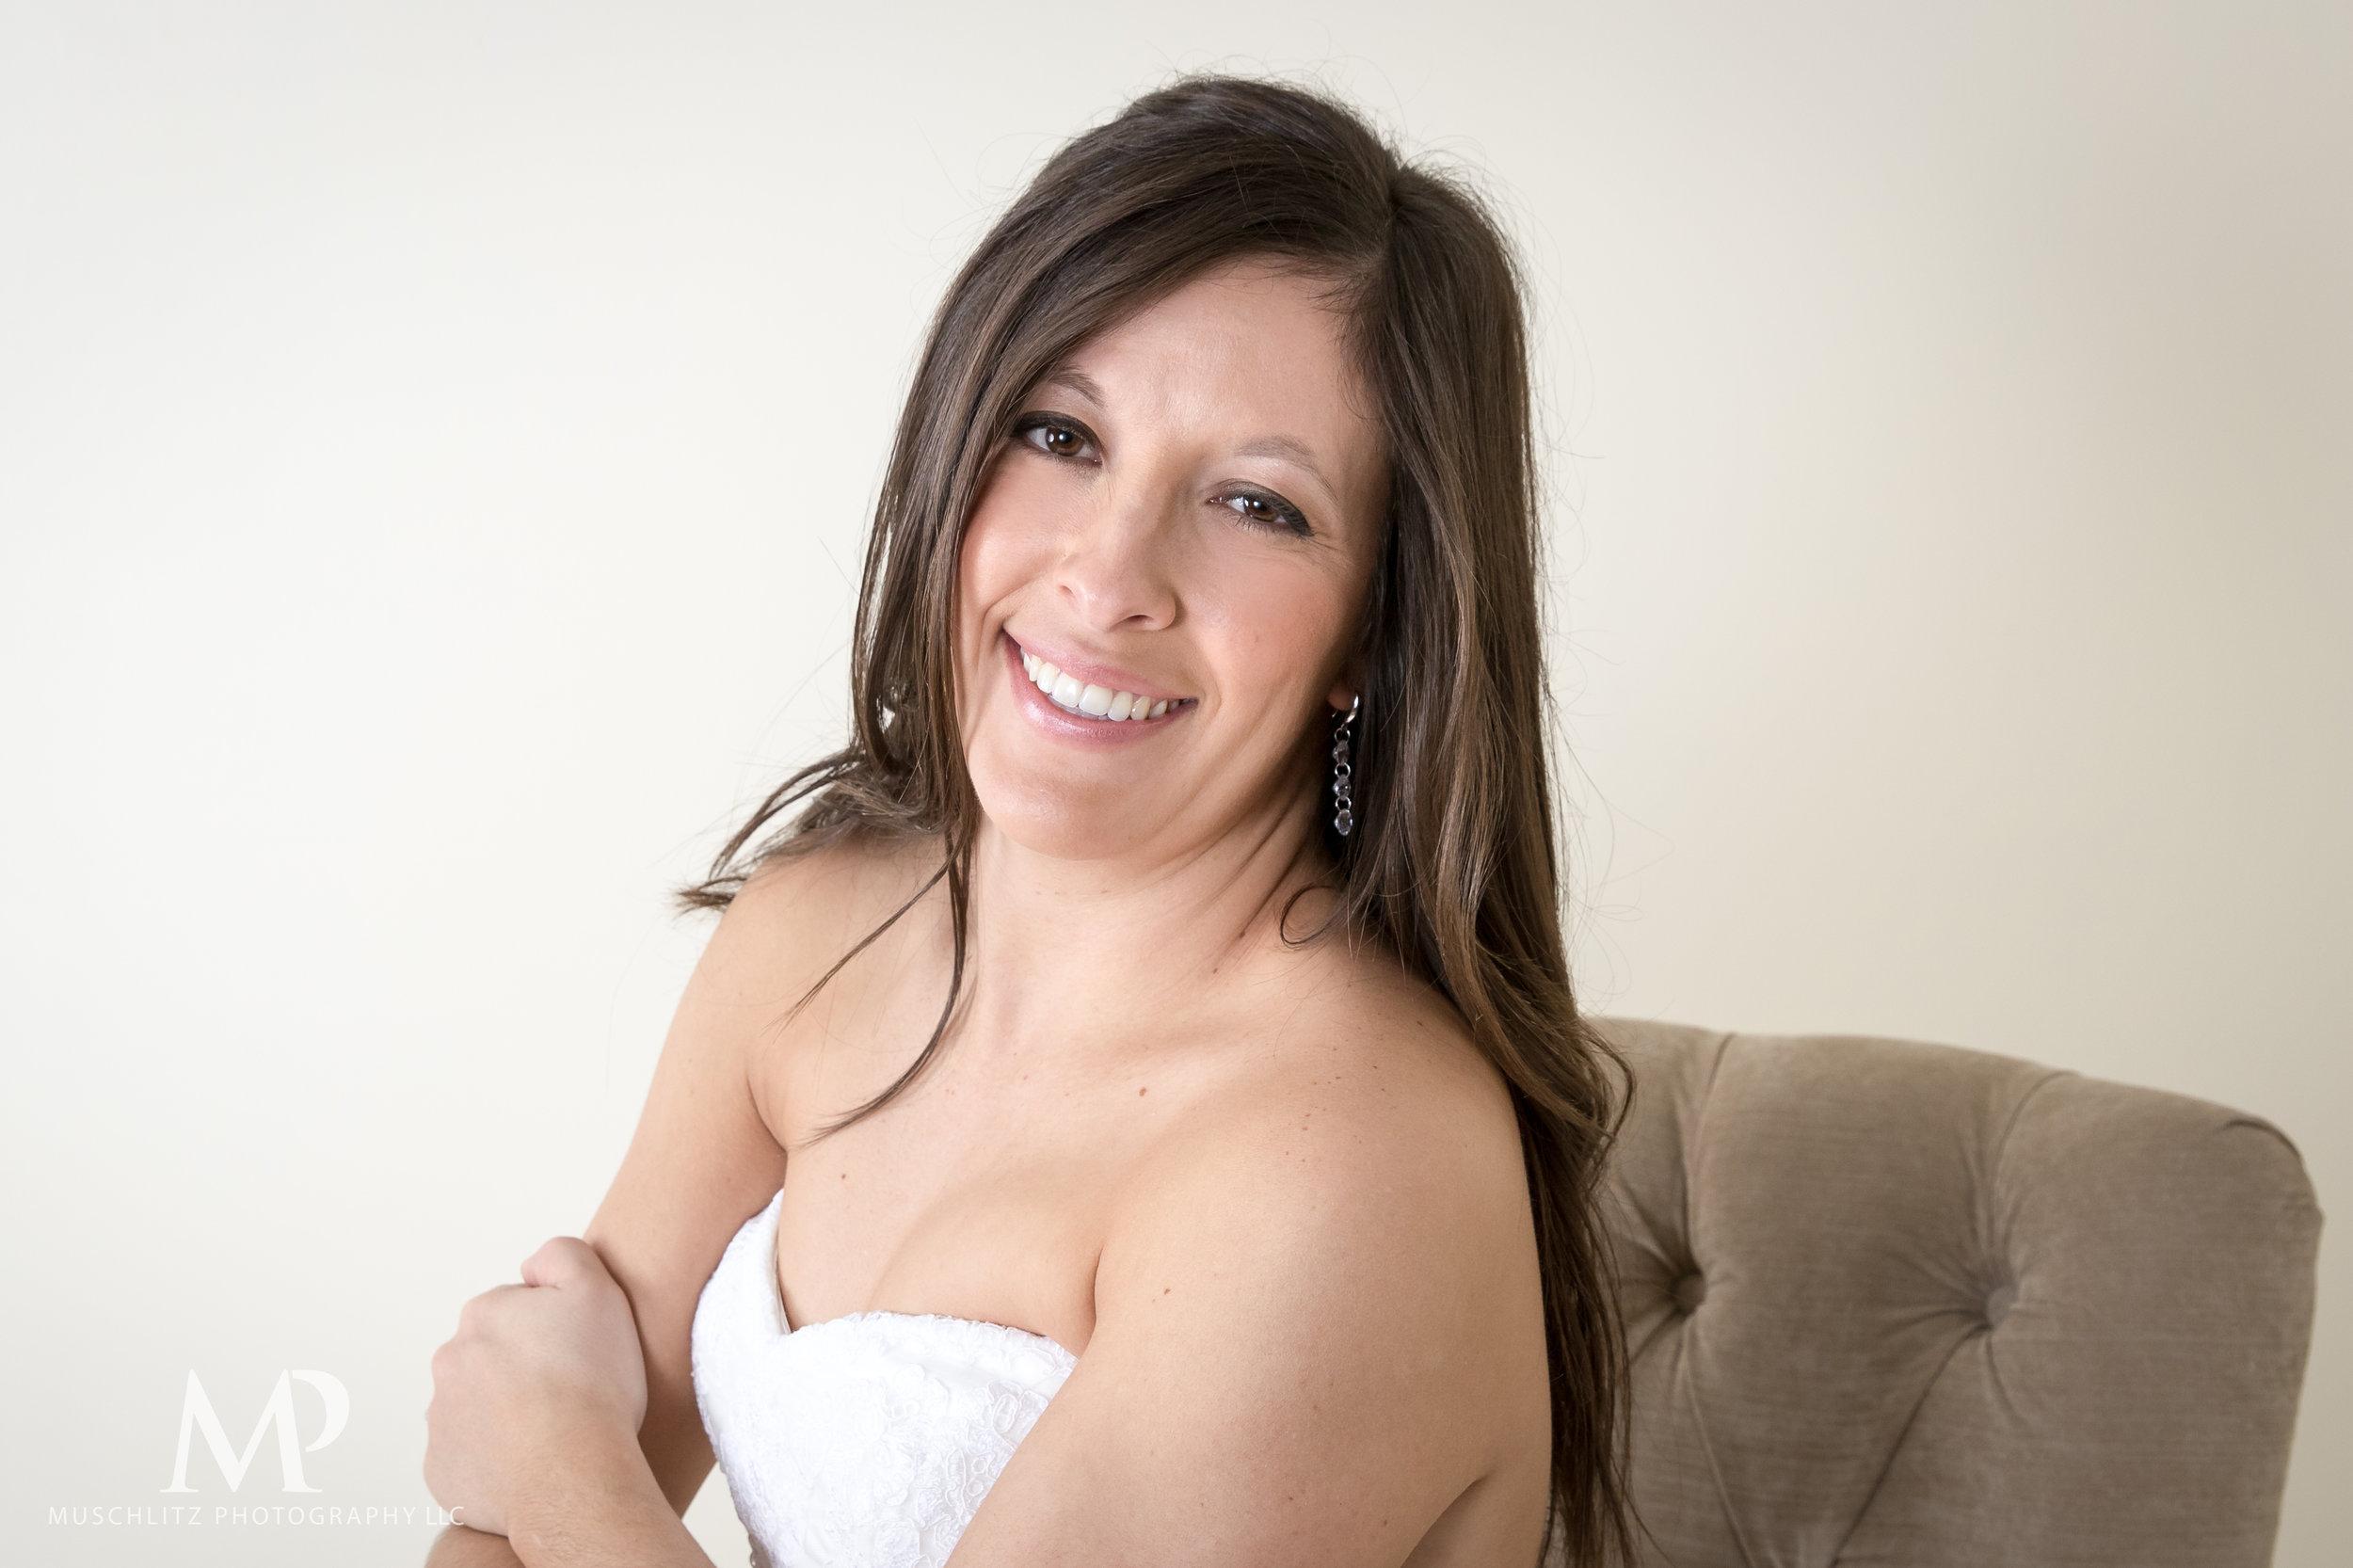 beauty-bridal-glam-the-dress-portraits-photographer-studio-columbus-ohio-gahanna-muschlitz-photography-022.JPG